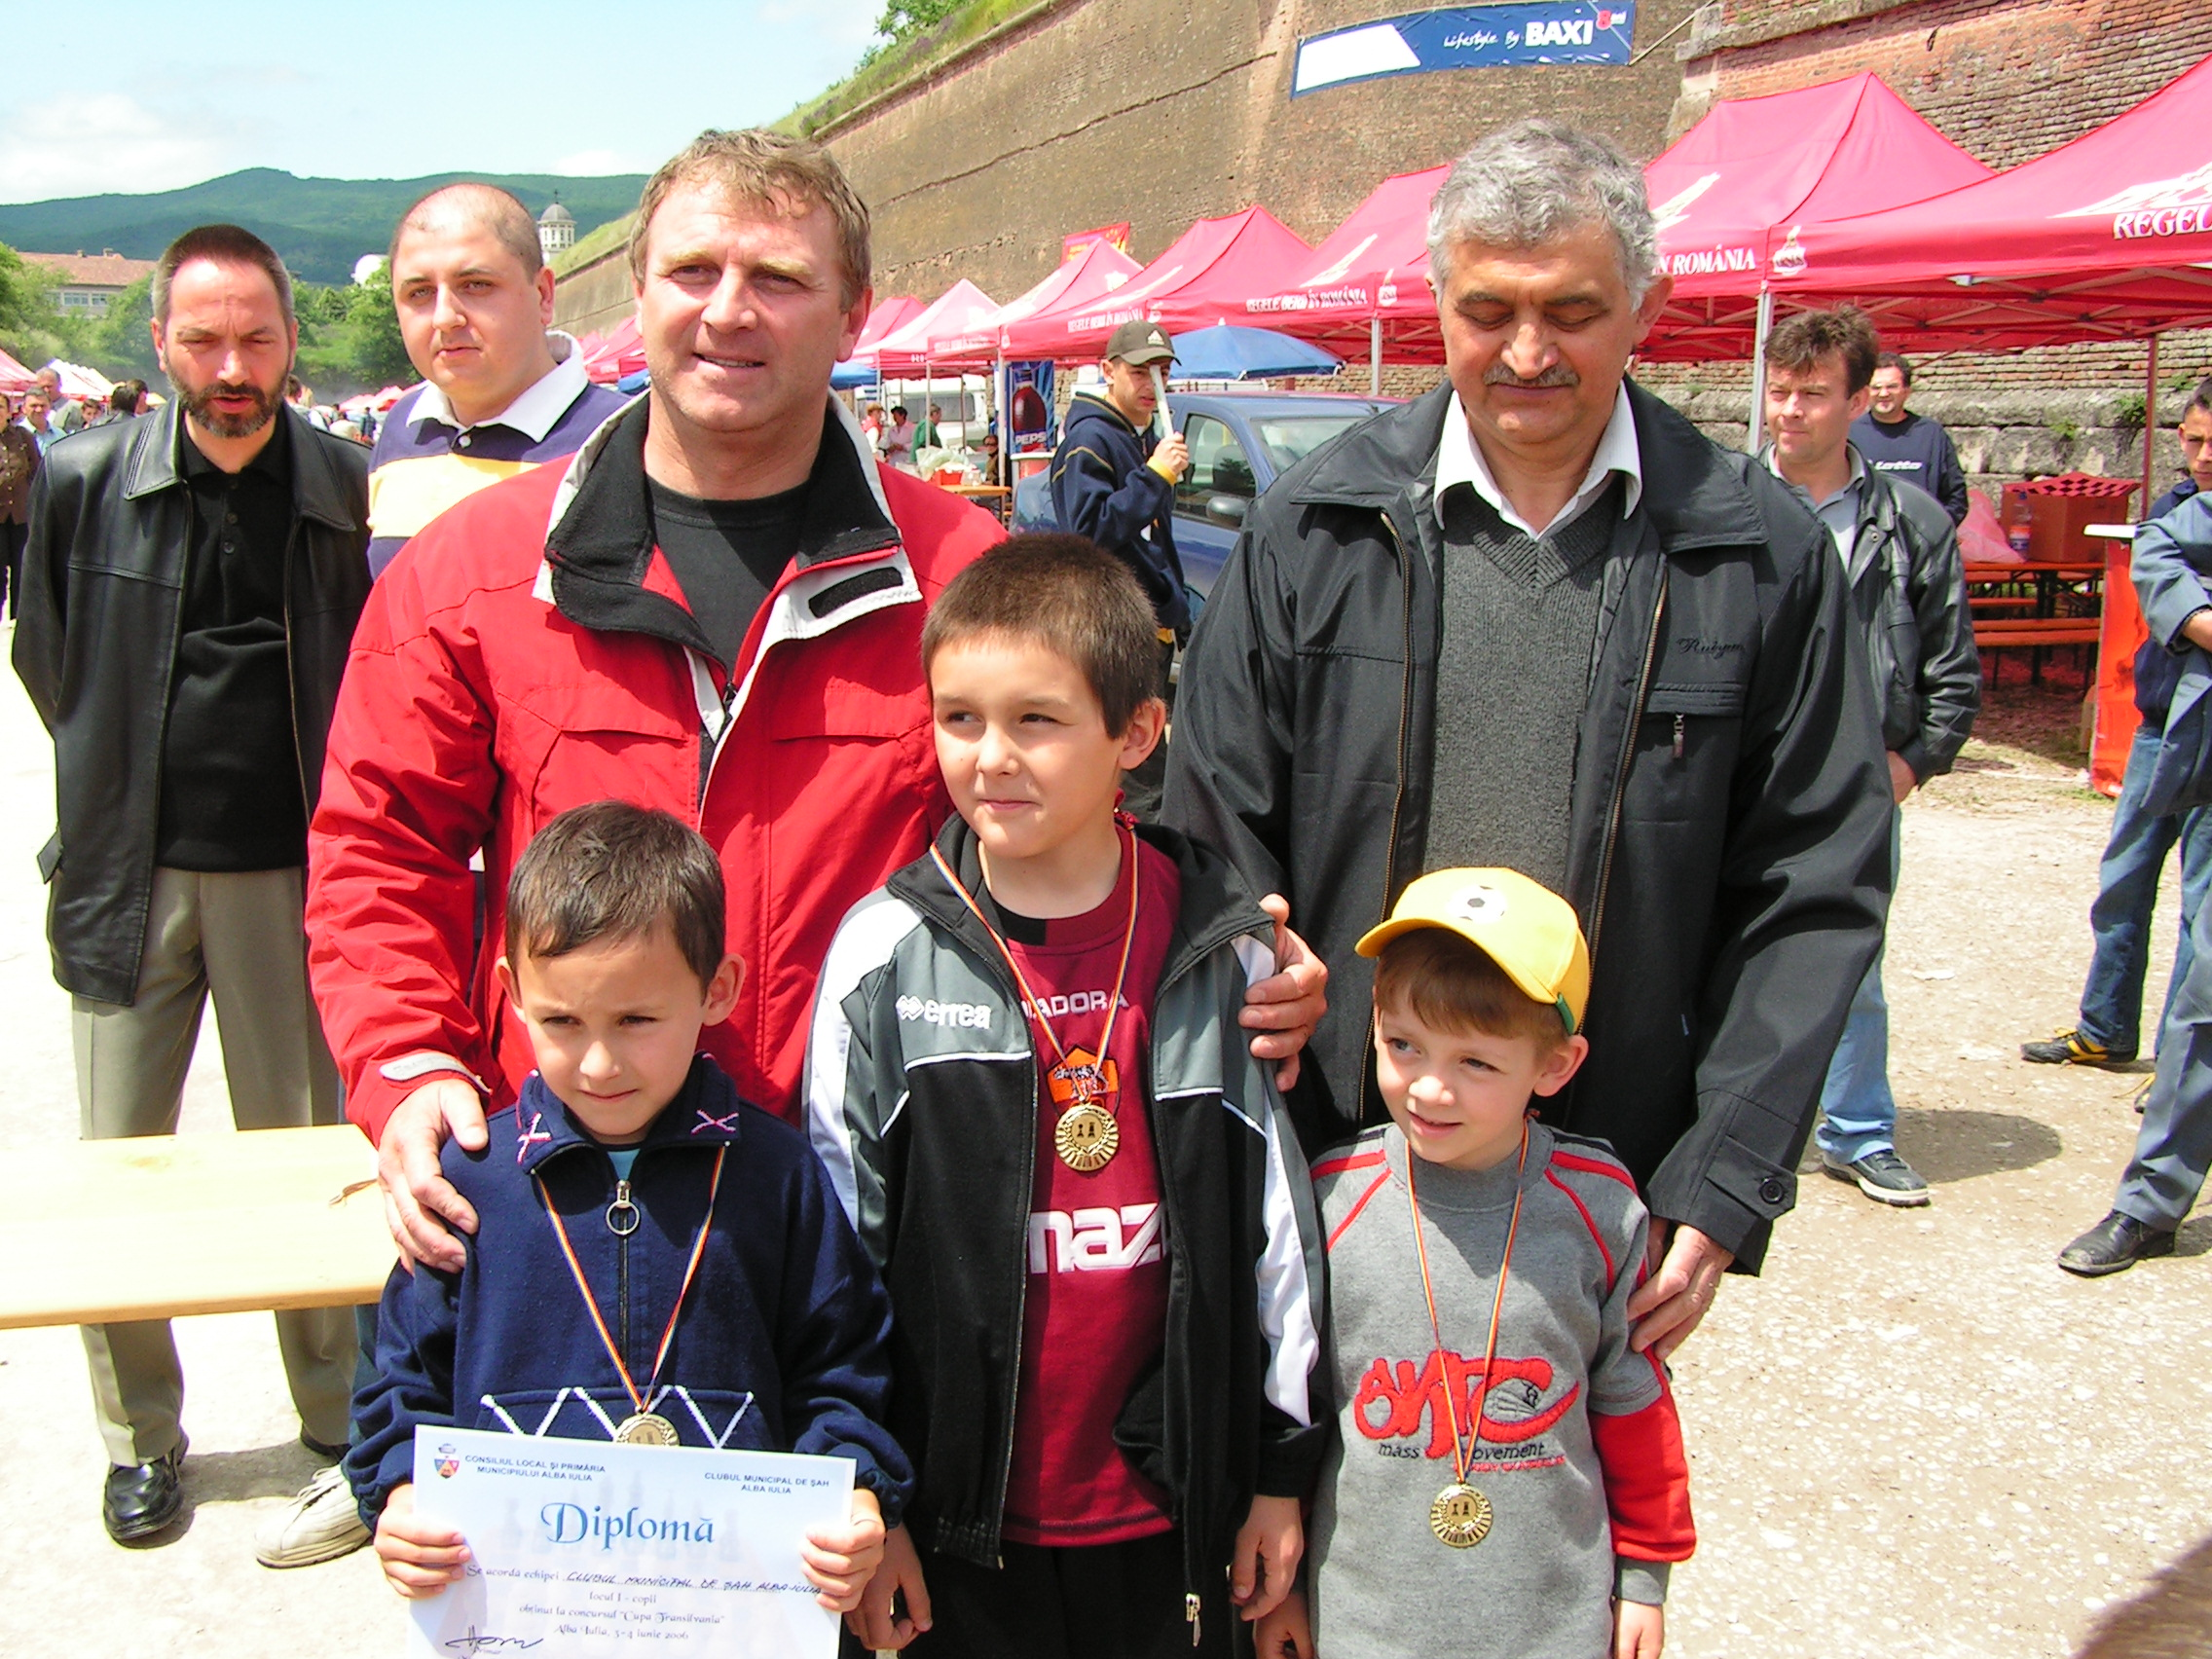 Cupa Transilvania 2006 - CMS Alba Iulia - copii locul 1